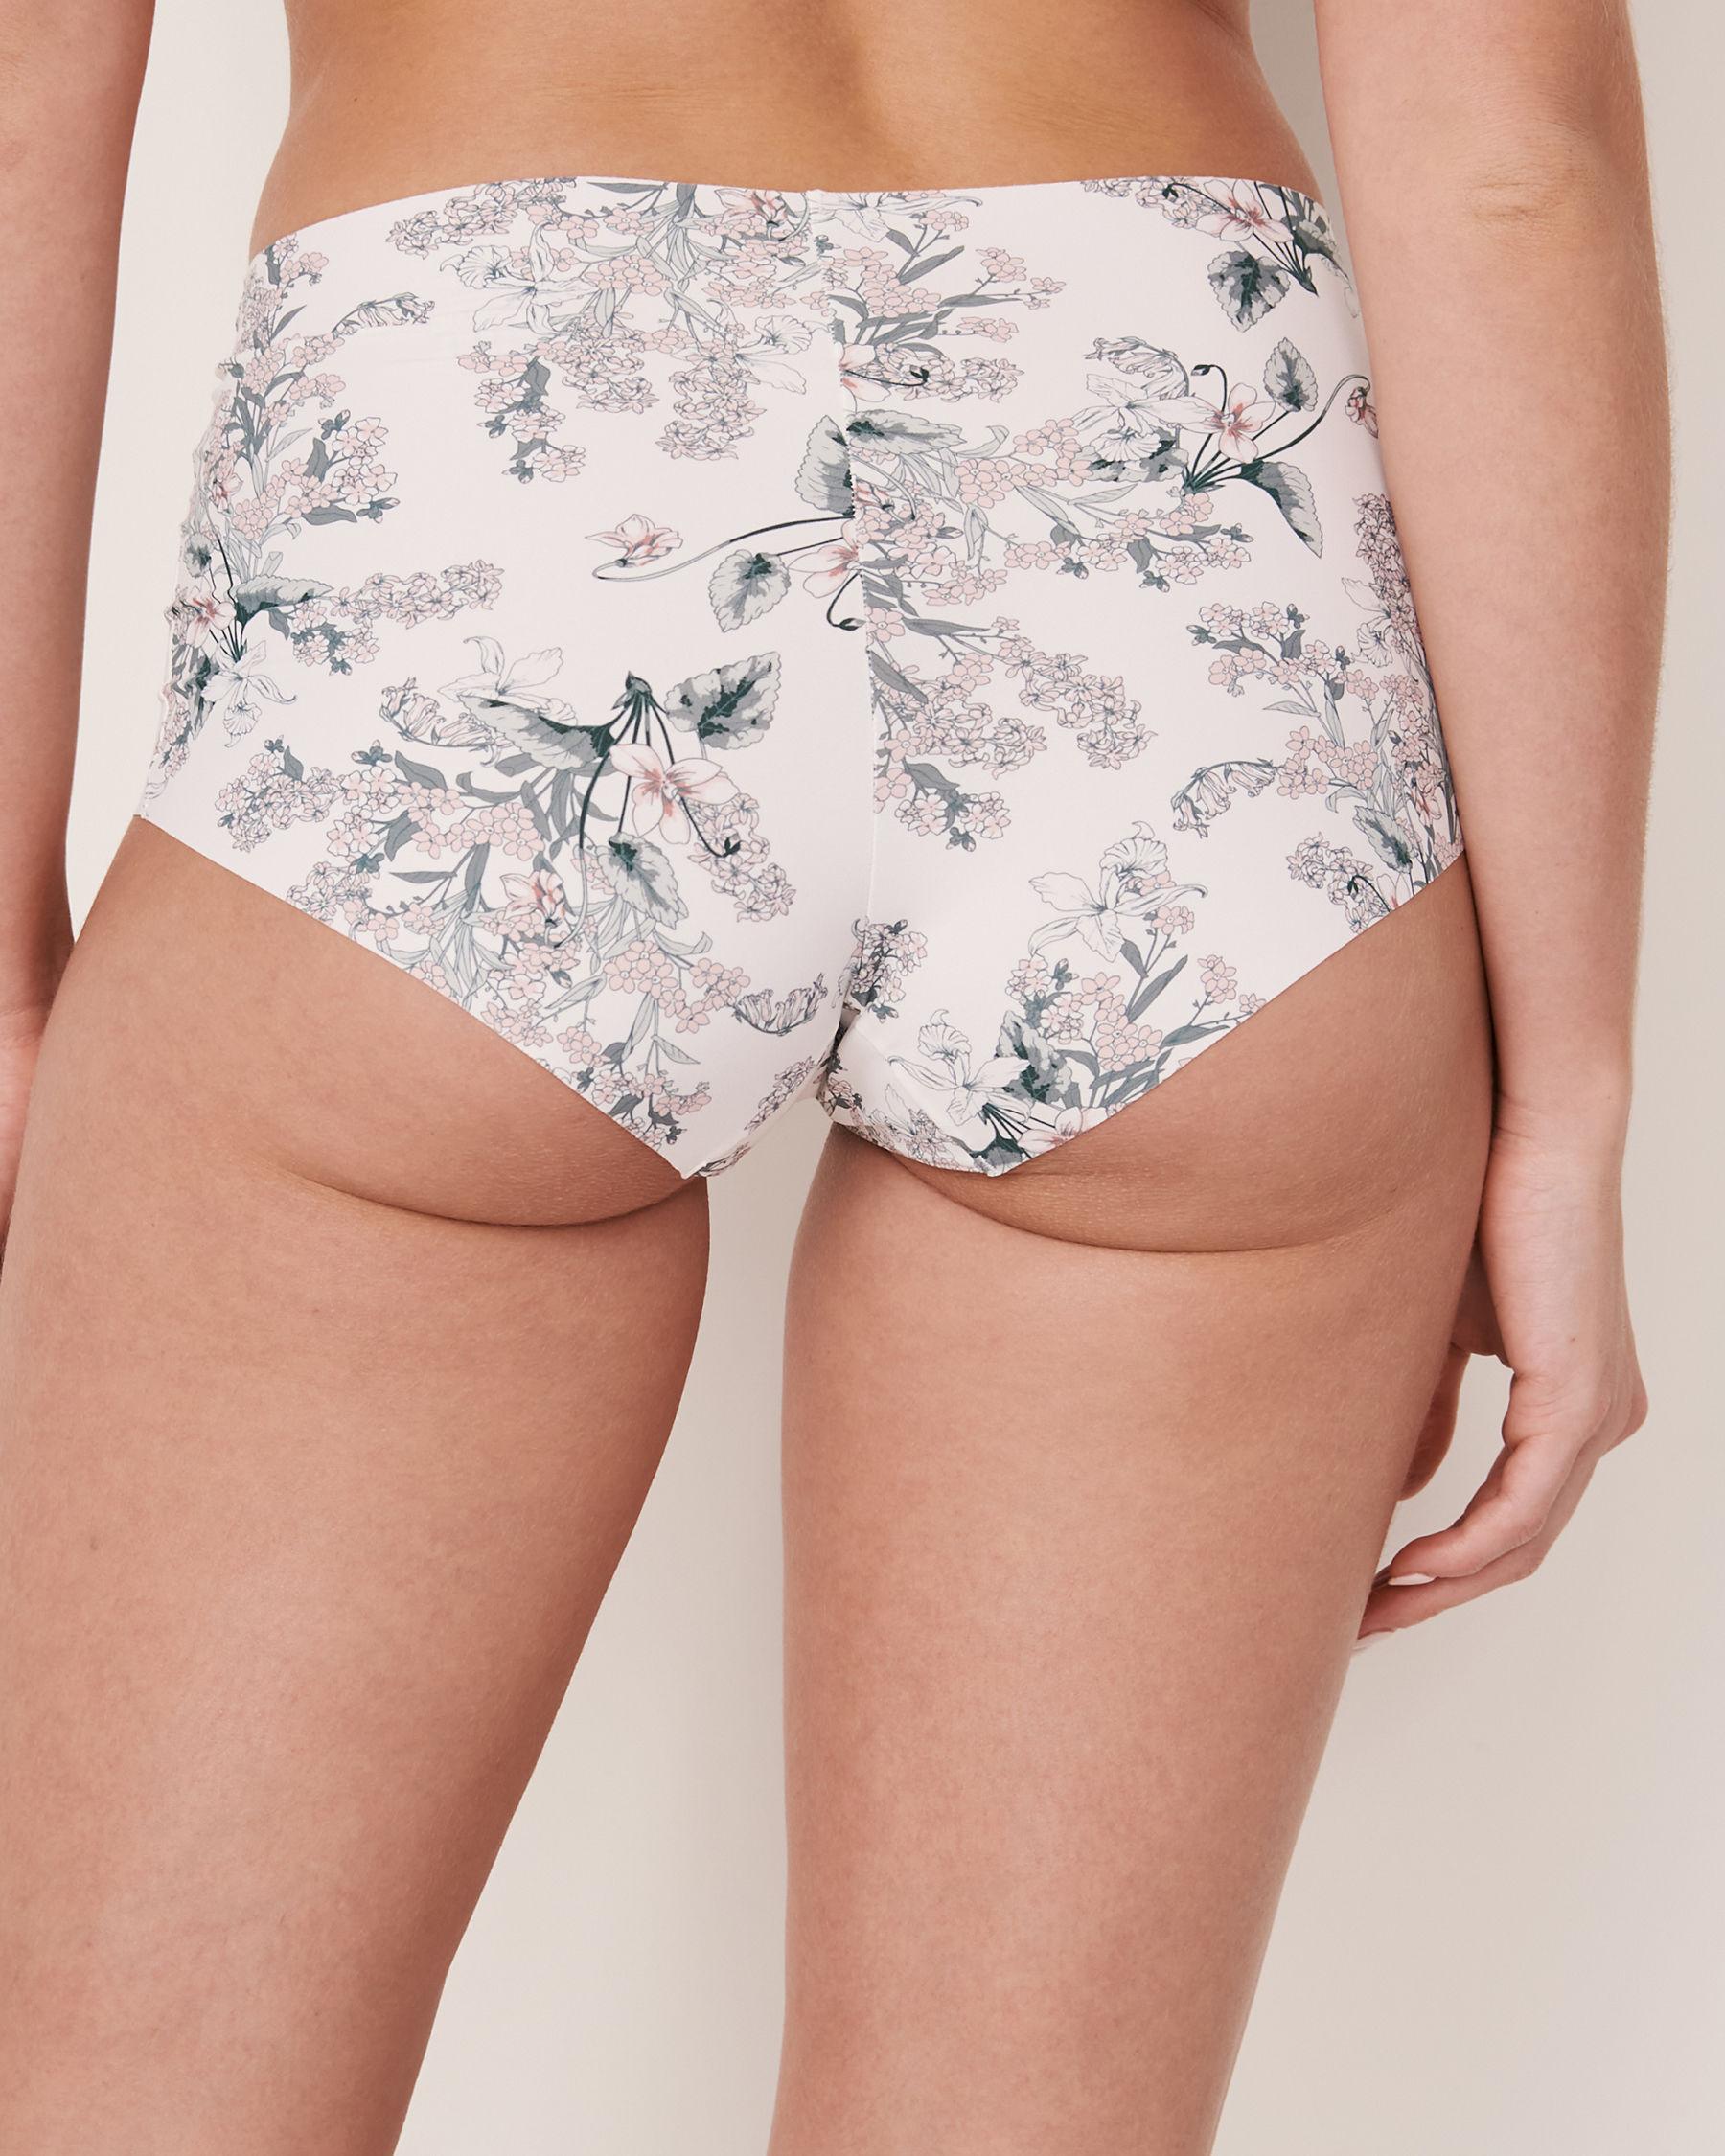 LA VIE EN ROSE Seamless High Waist Bikini Panty Flower bouquet 20200050 - View2